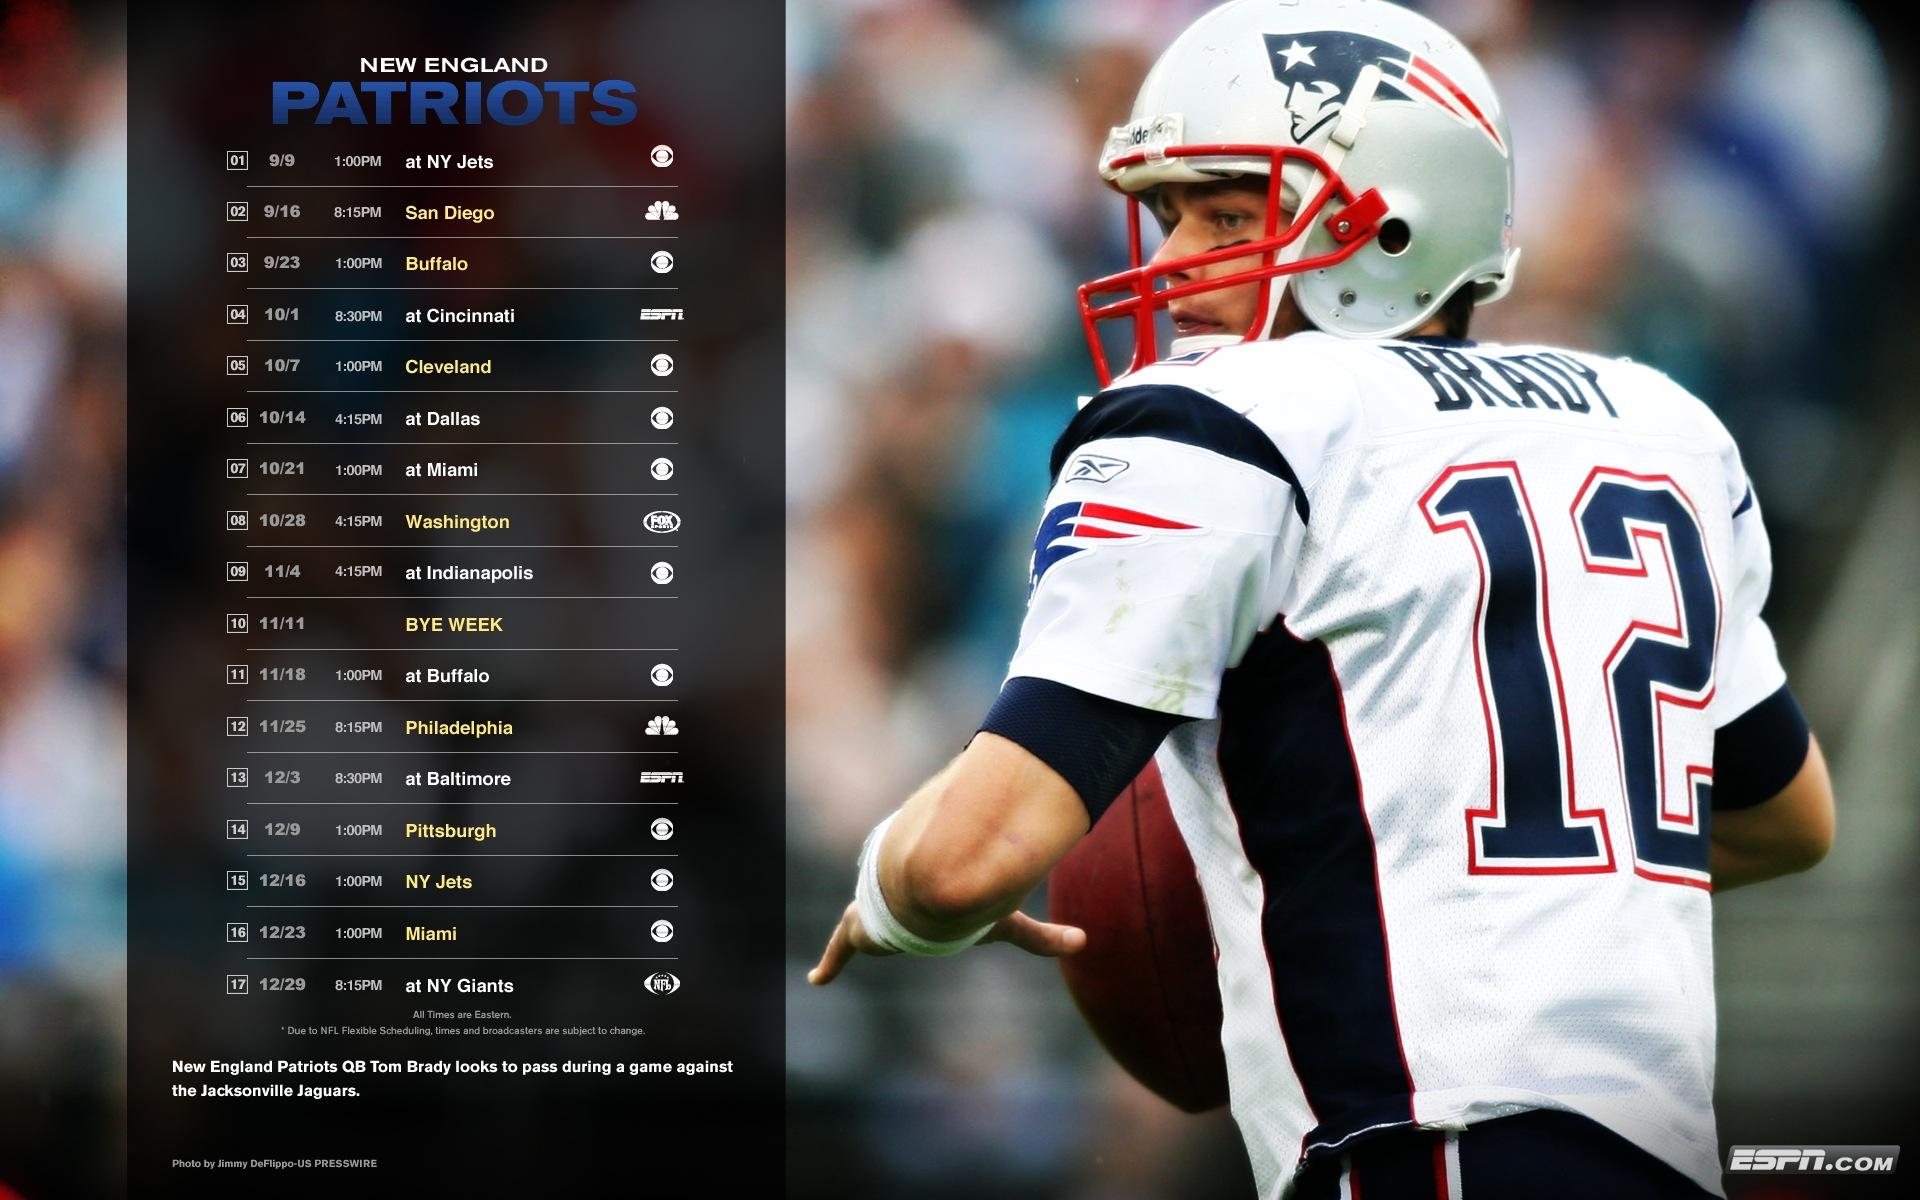 Patriots 2015 NFL Wallpaper Sport 95666 high quality Backgrounds 1920x1200